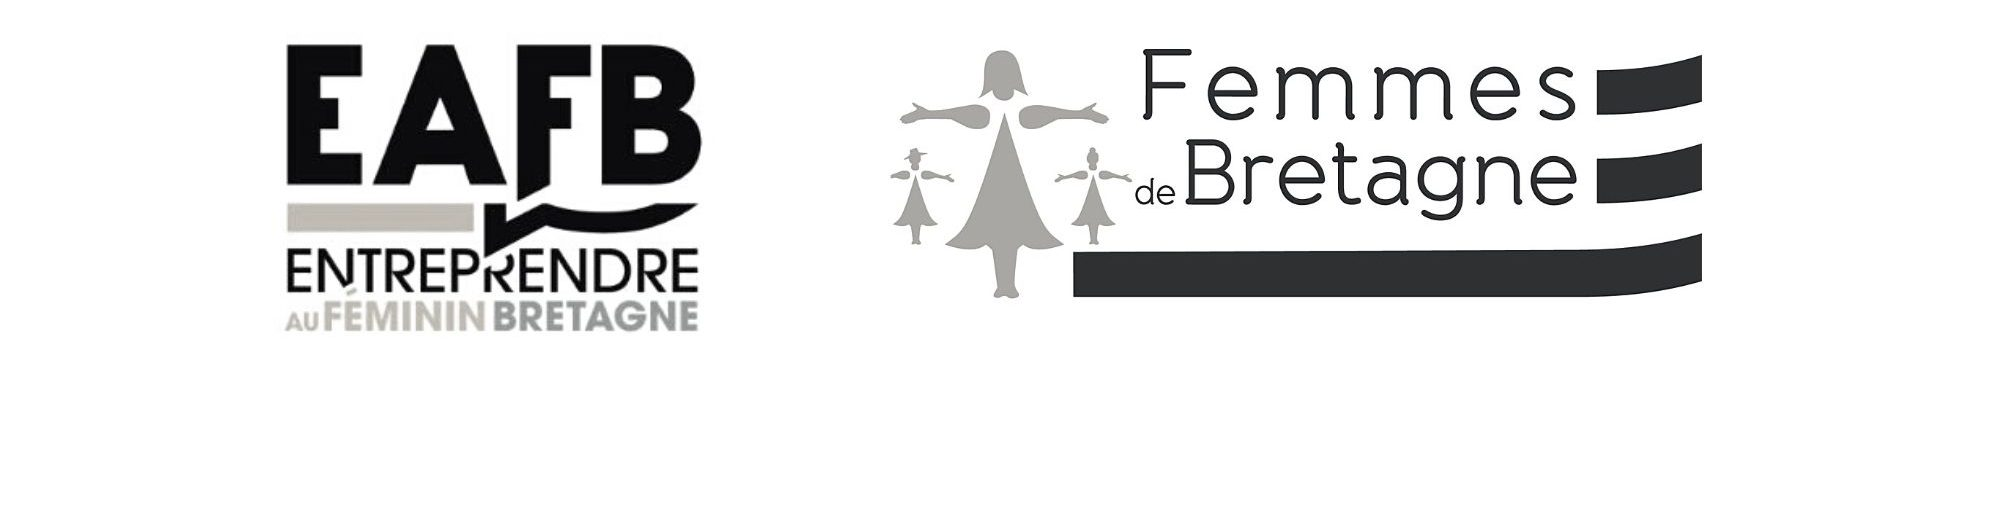 Entreprendre au Féminin - Erialla Communication